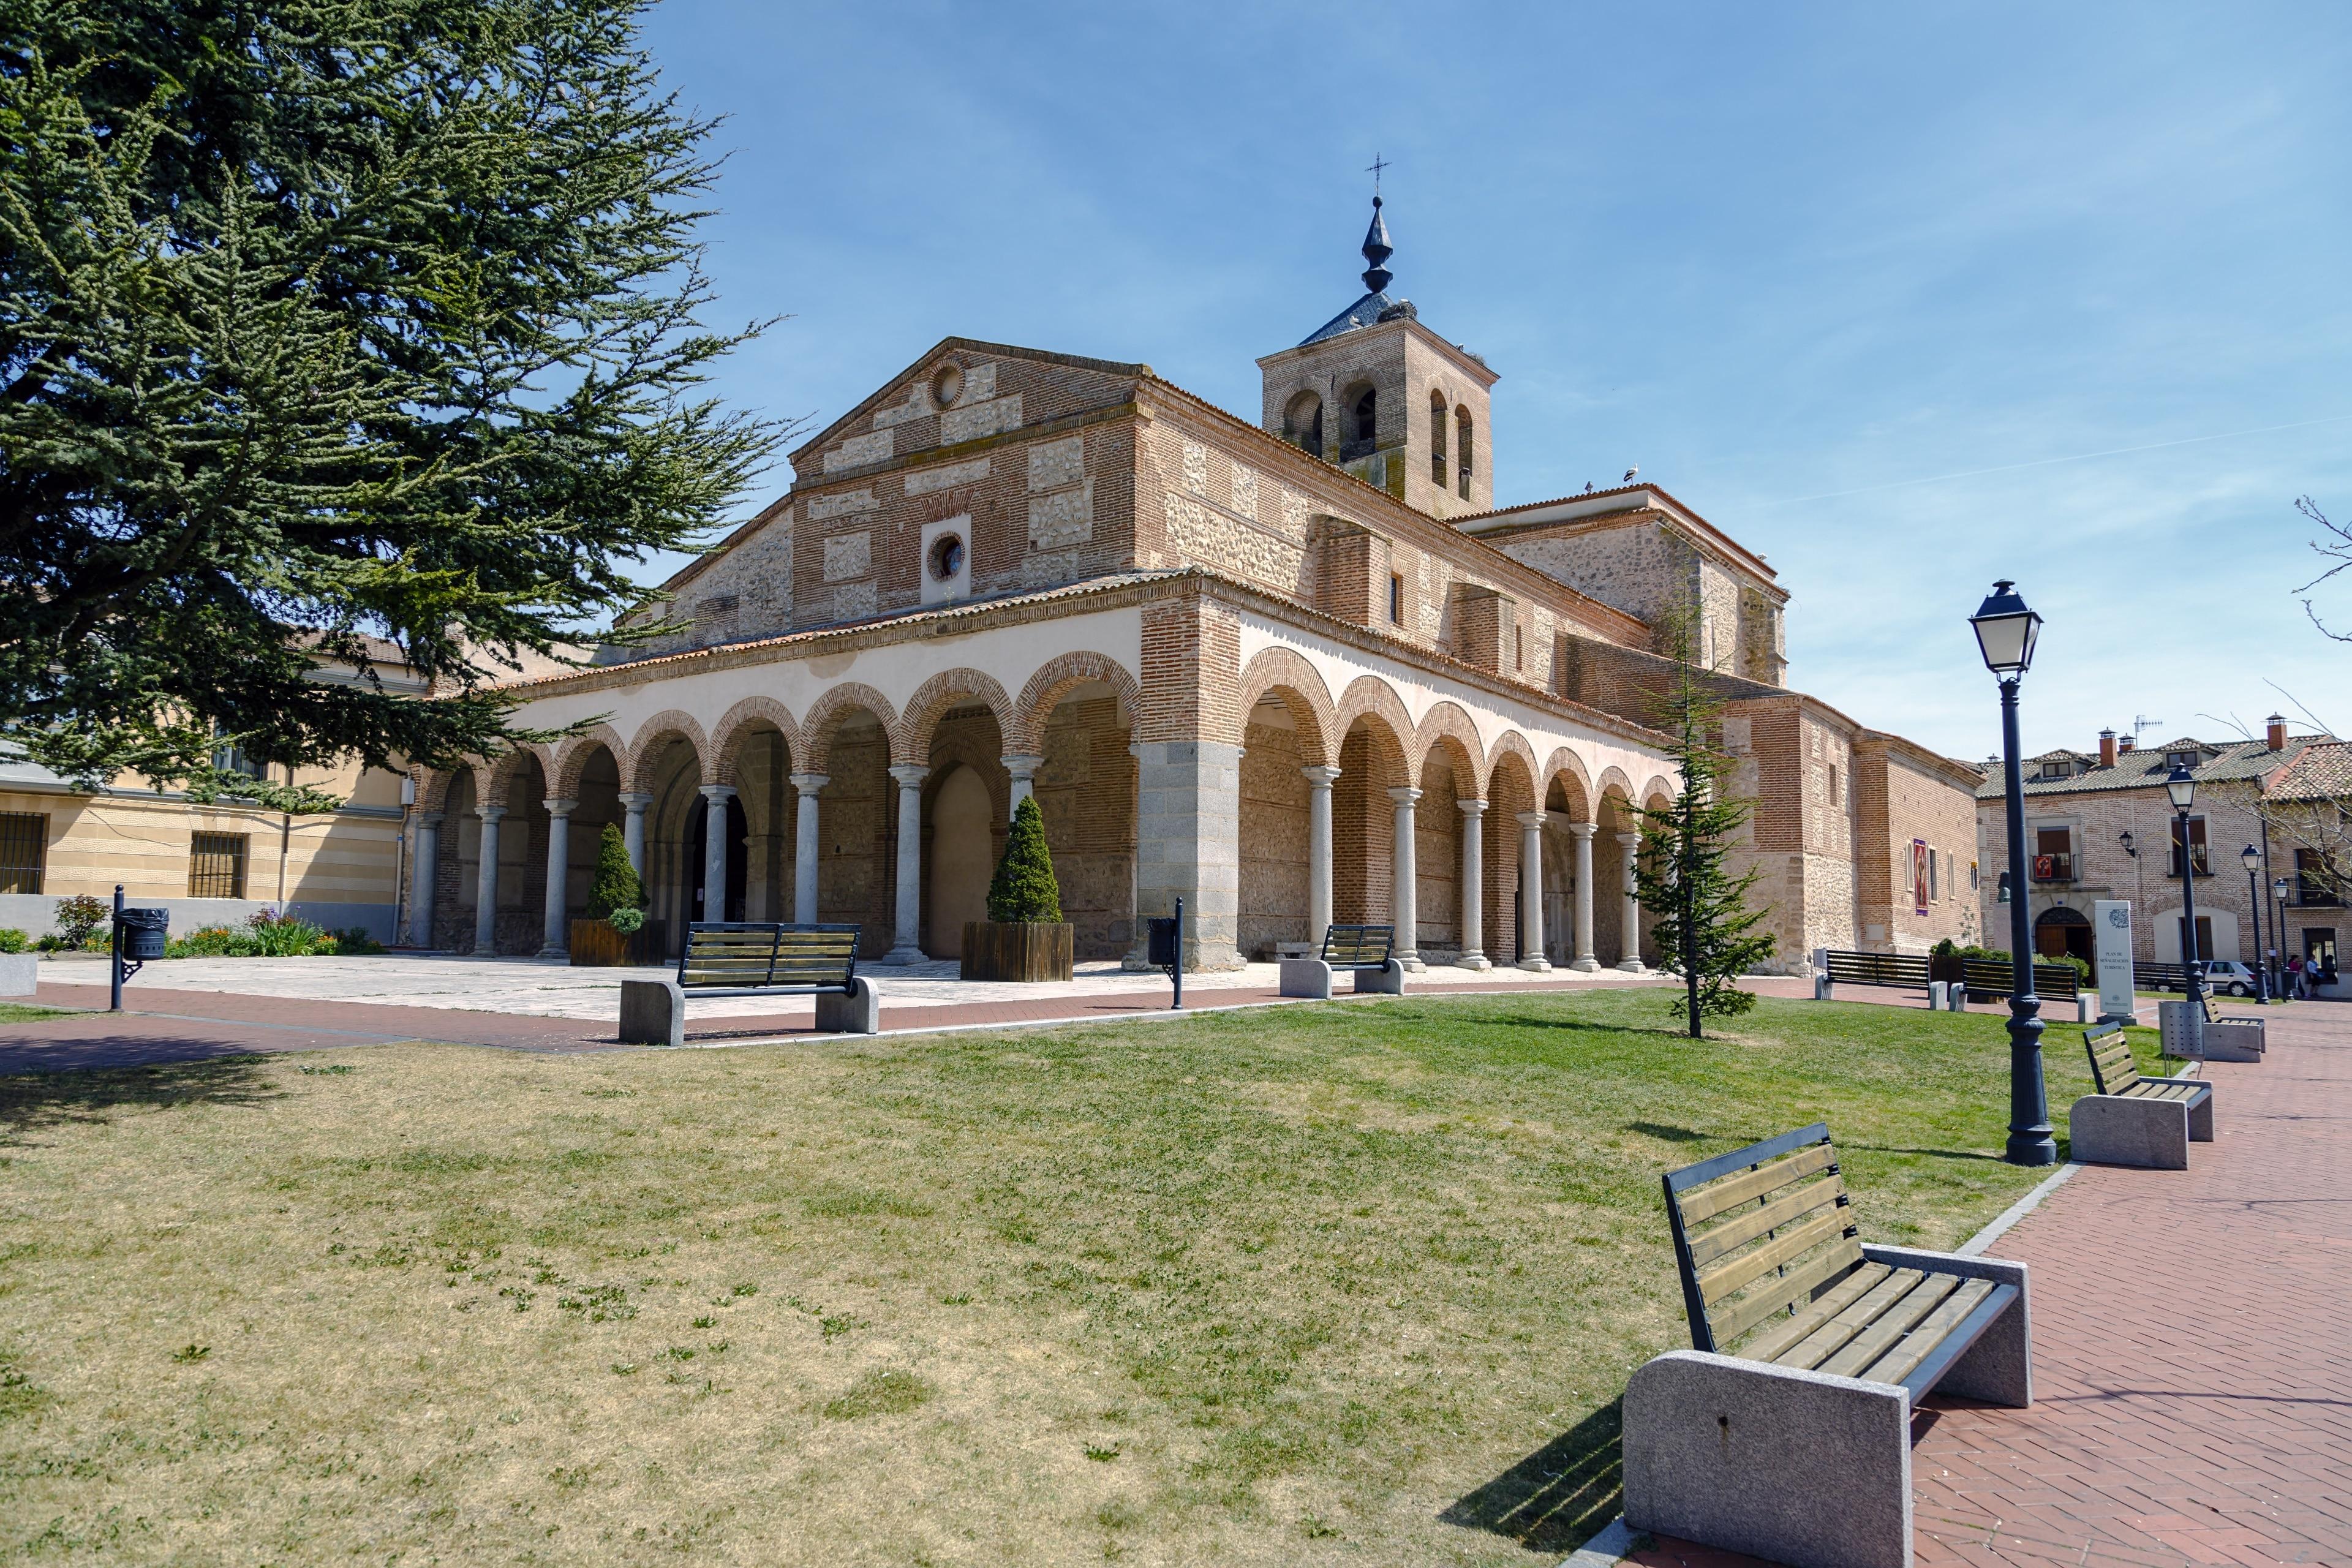 Olmedo, Castile and Leon, Spain